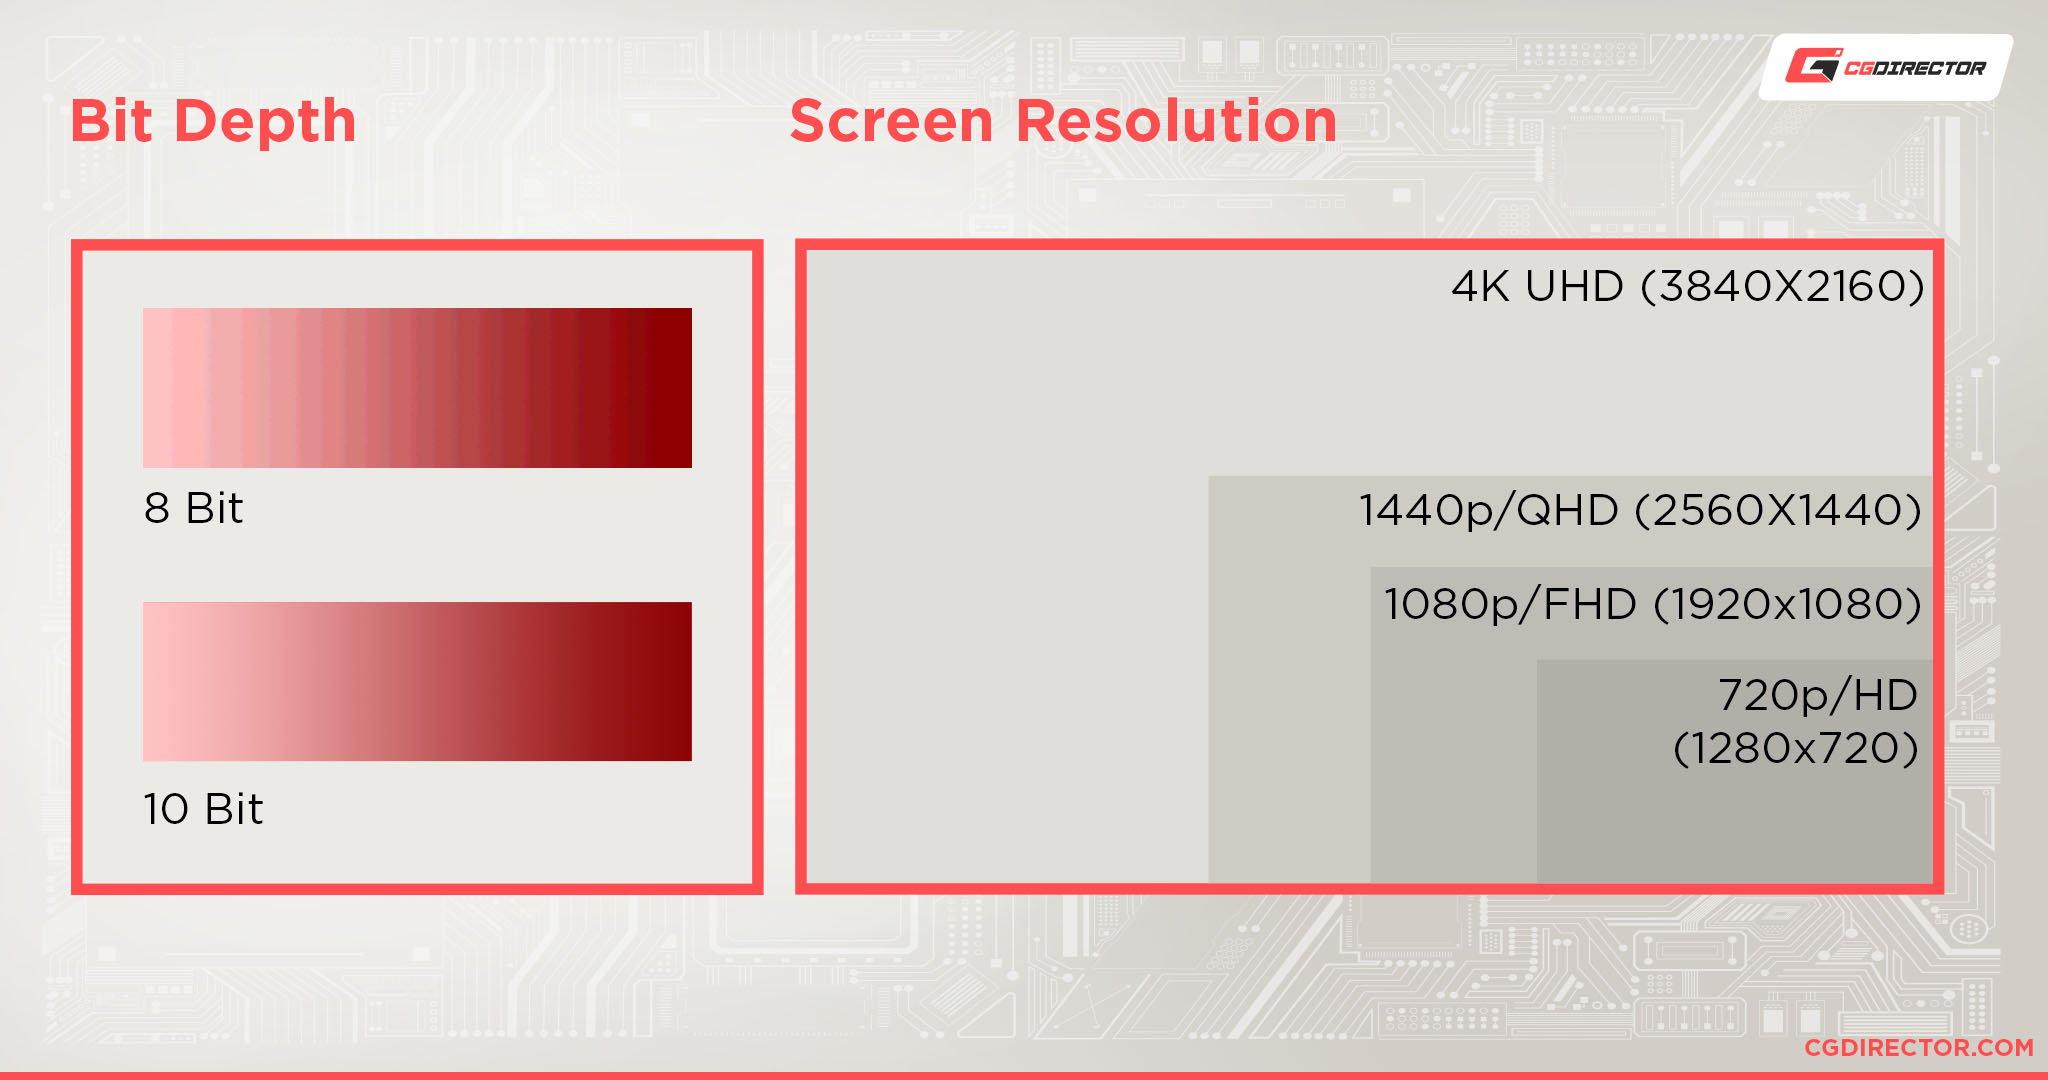 Bit depth and Screen Resolution